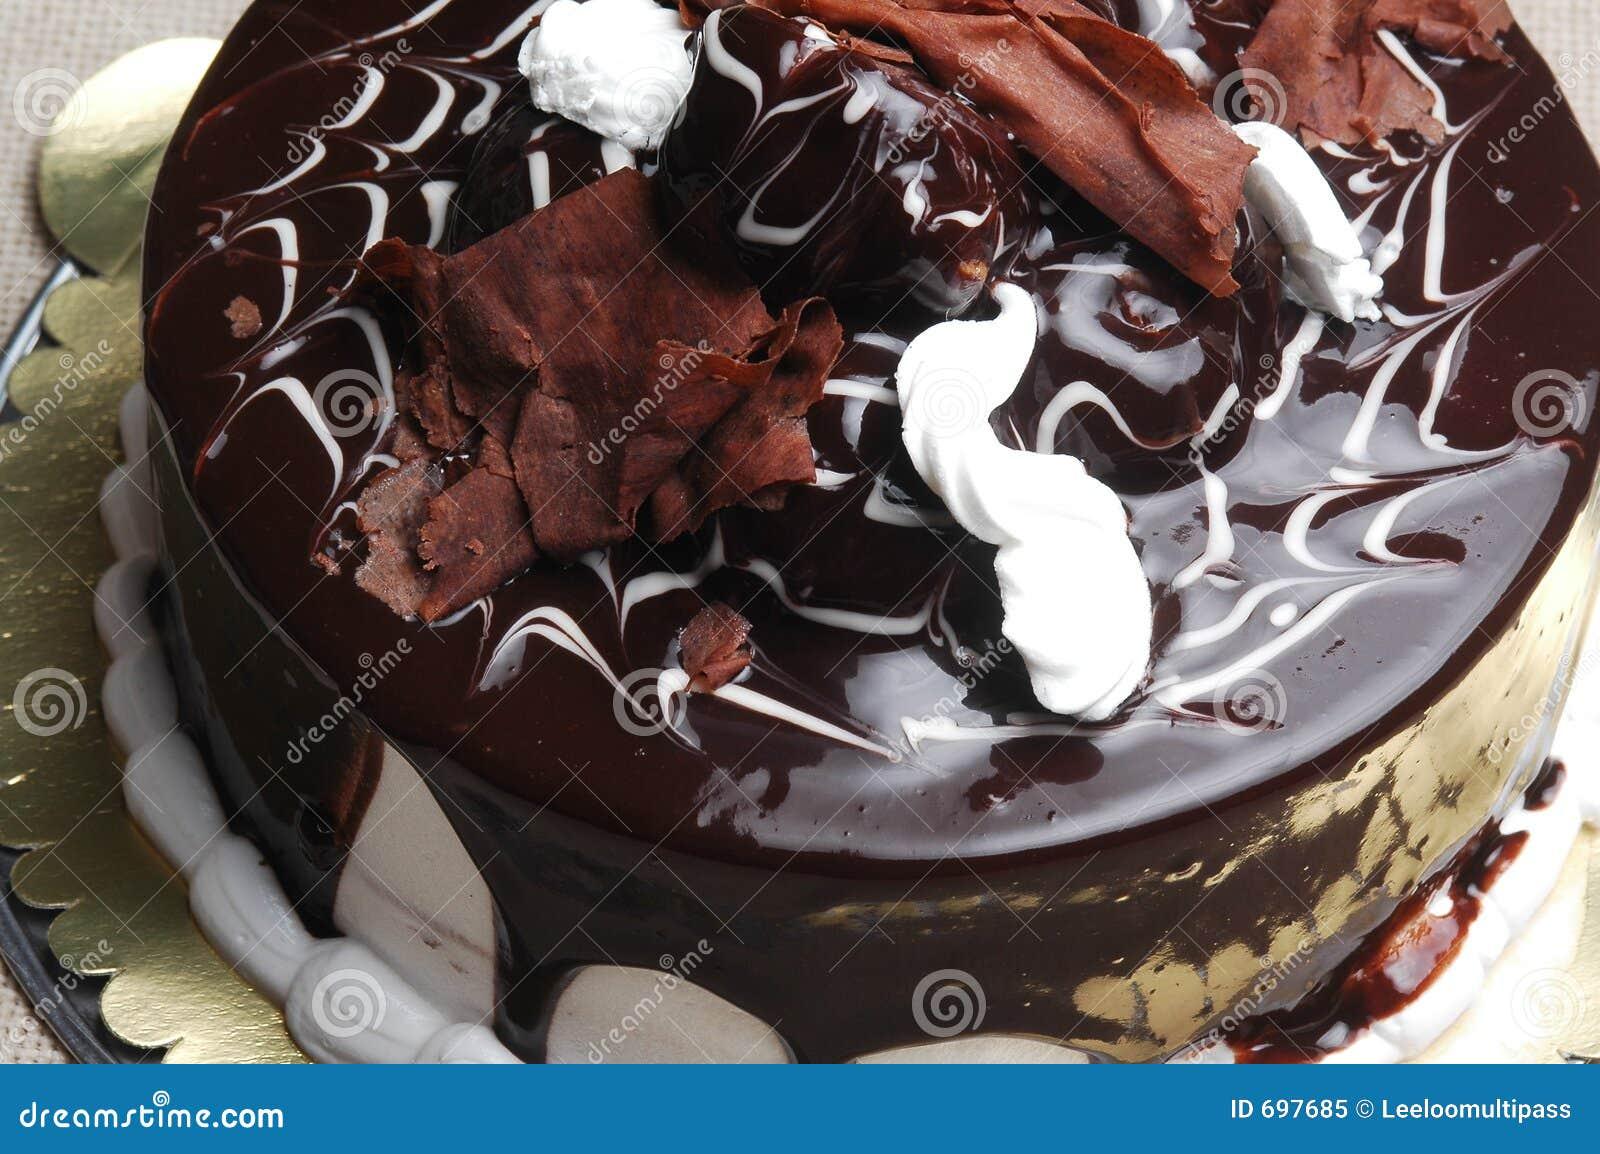 Chocolate Cream Cheese Coffee Cake